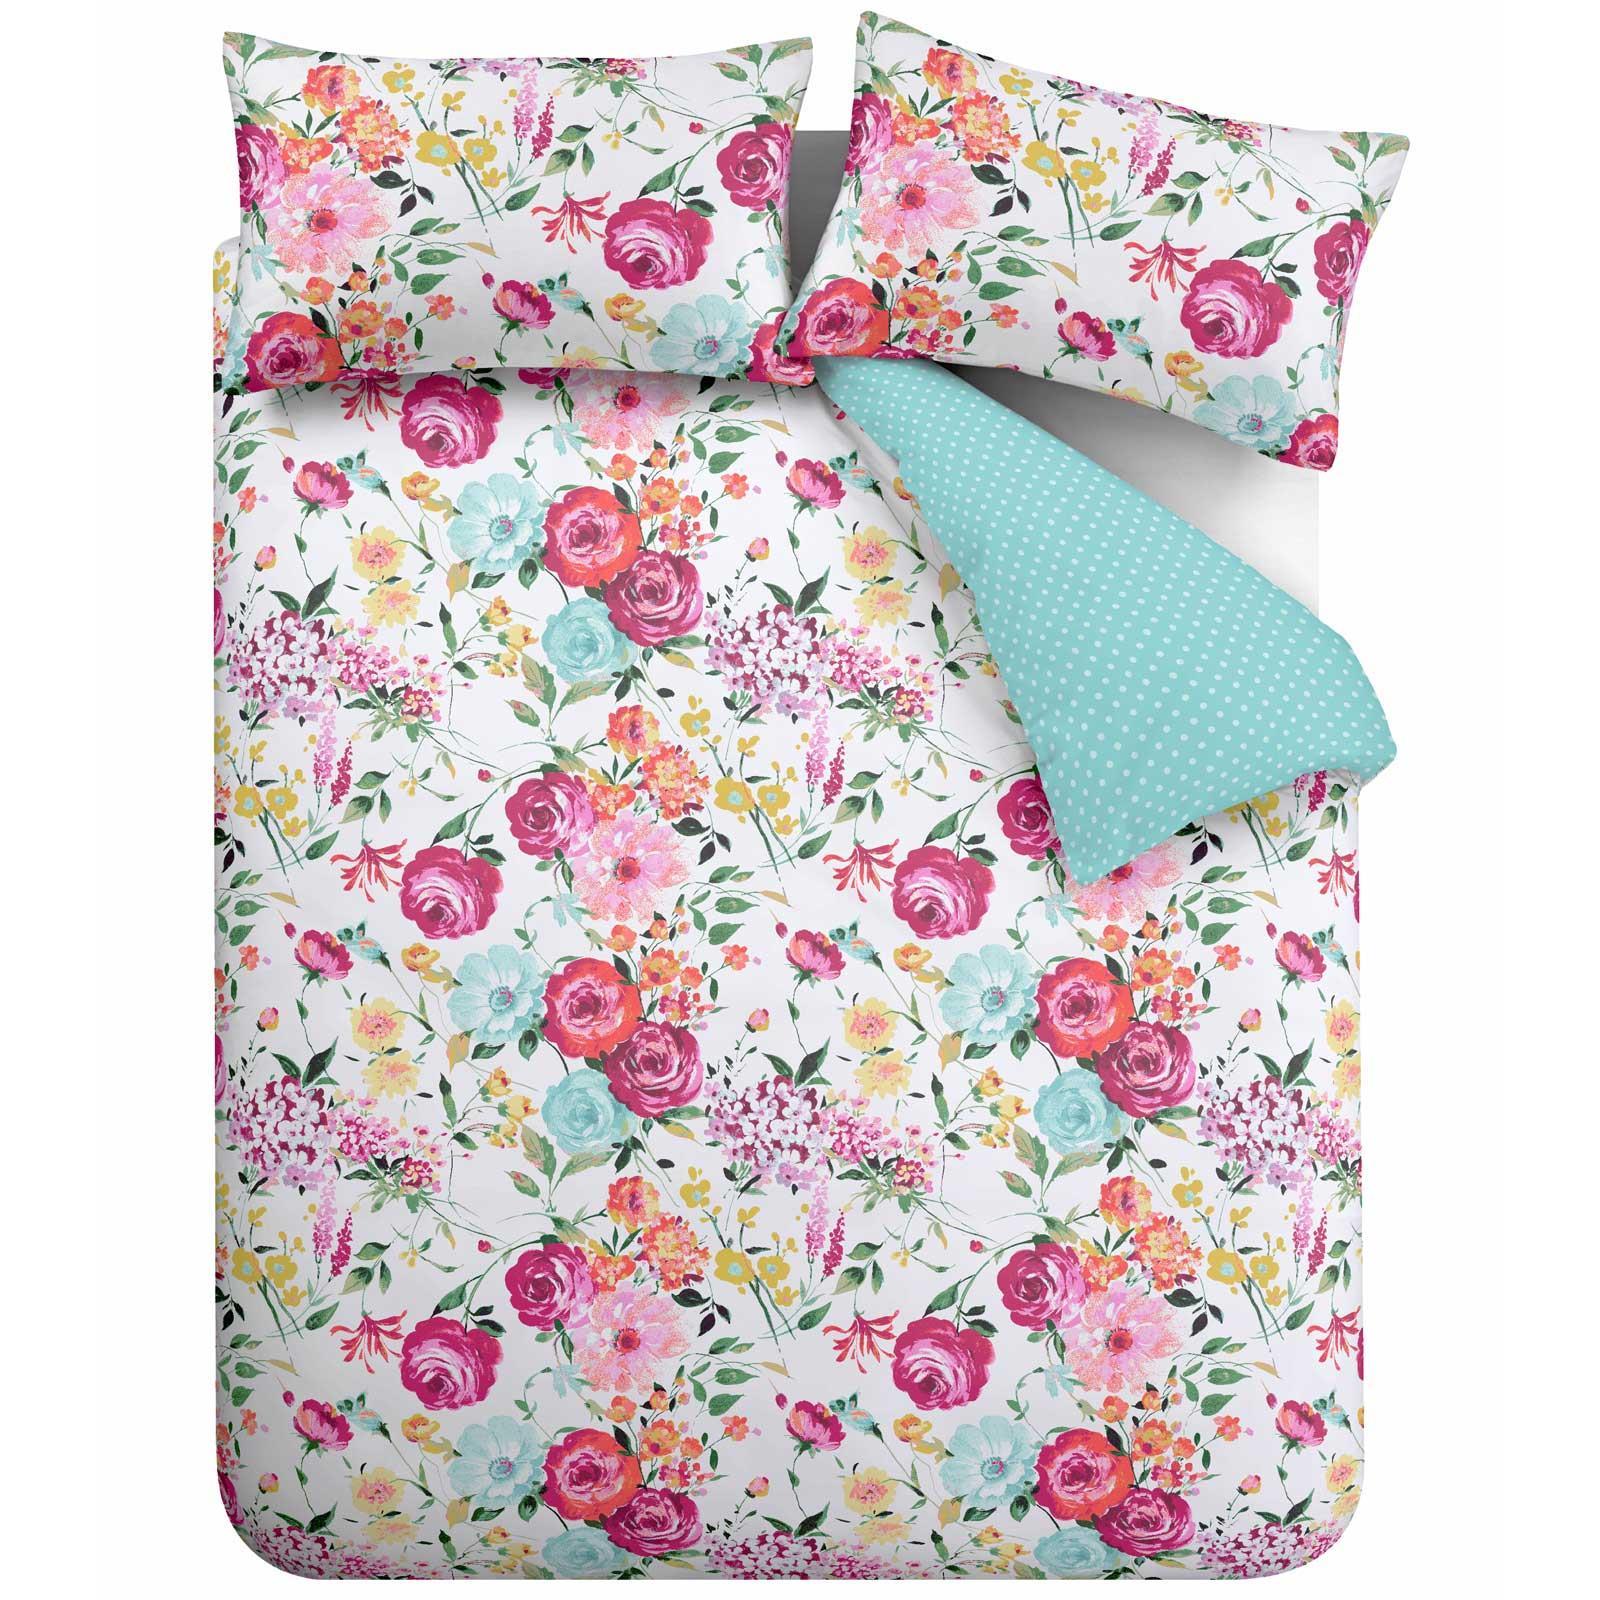 Catherine-Lansfield-Salisbury-Pink-cubierta-del-edredon-edredon-cubre-floral-de-conjuntos-de-cama miniatura 15